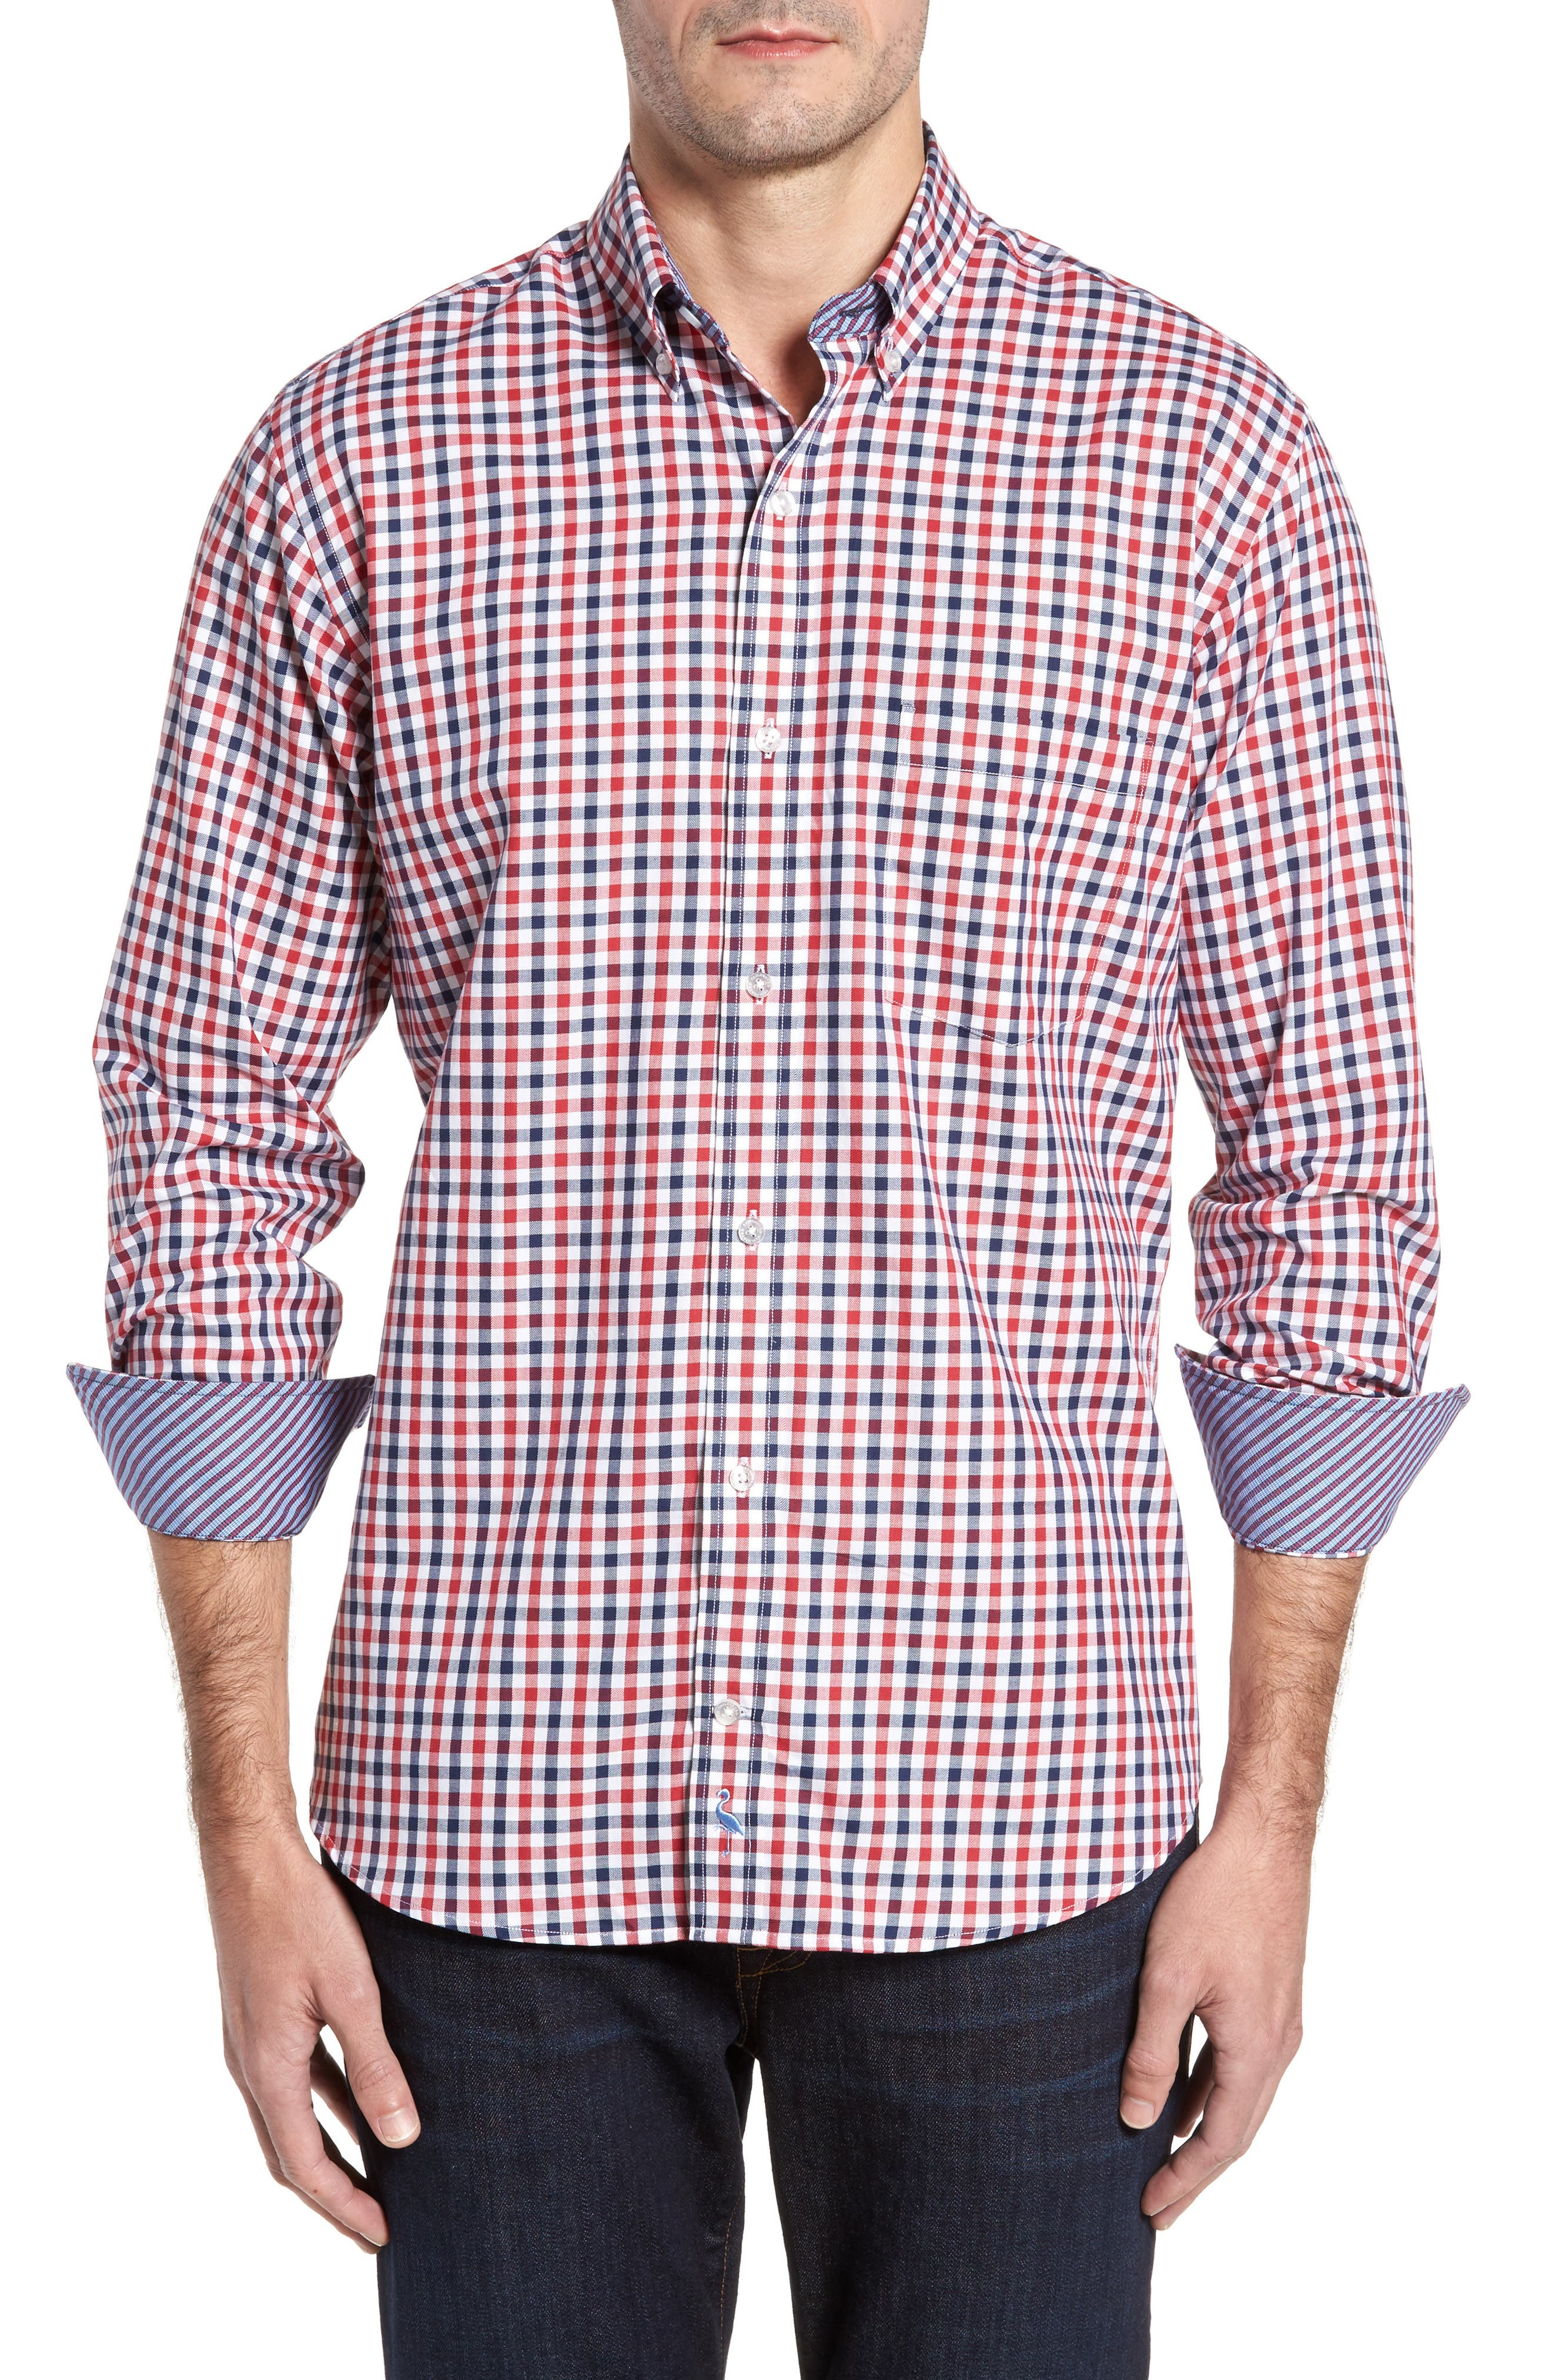 Main Image - TailorByrd Bernice Check Sport Shirt